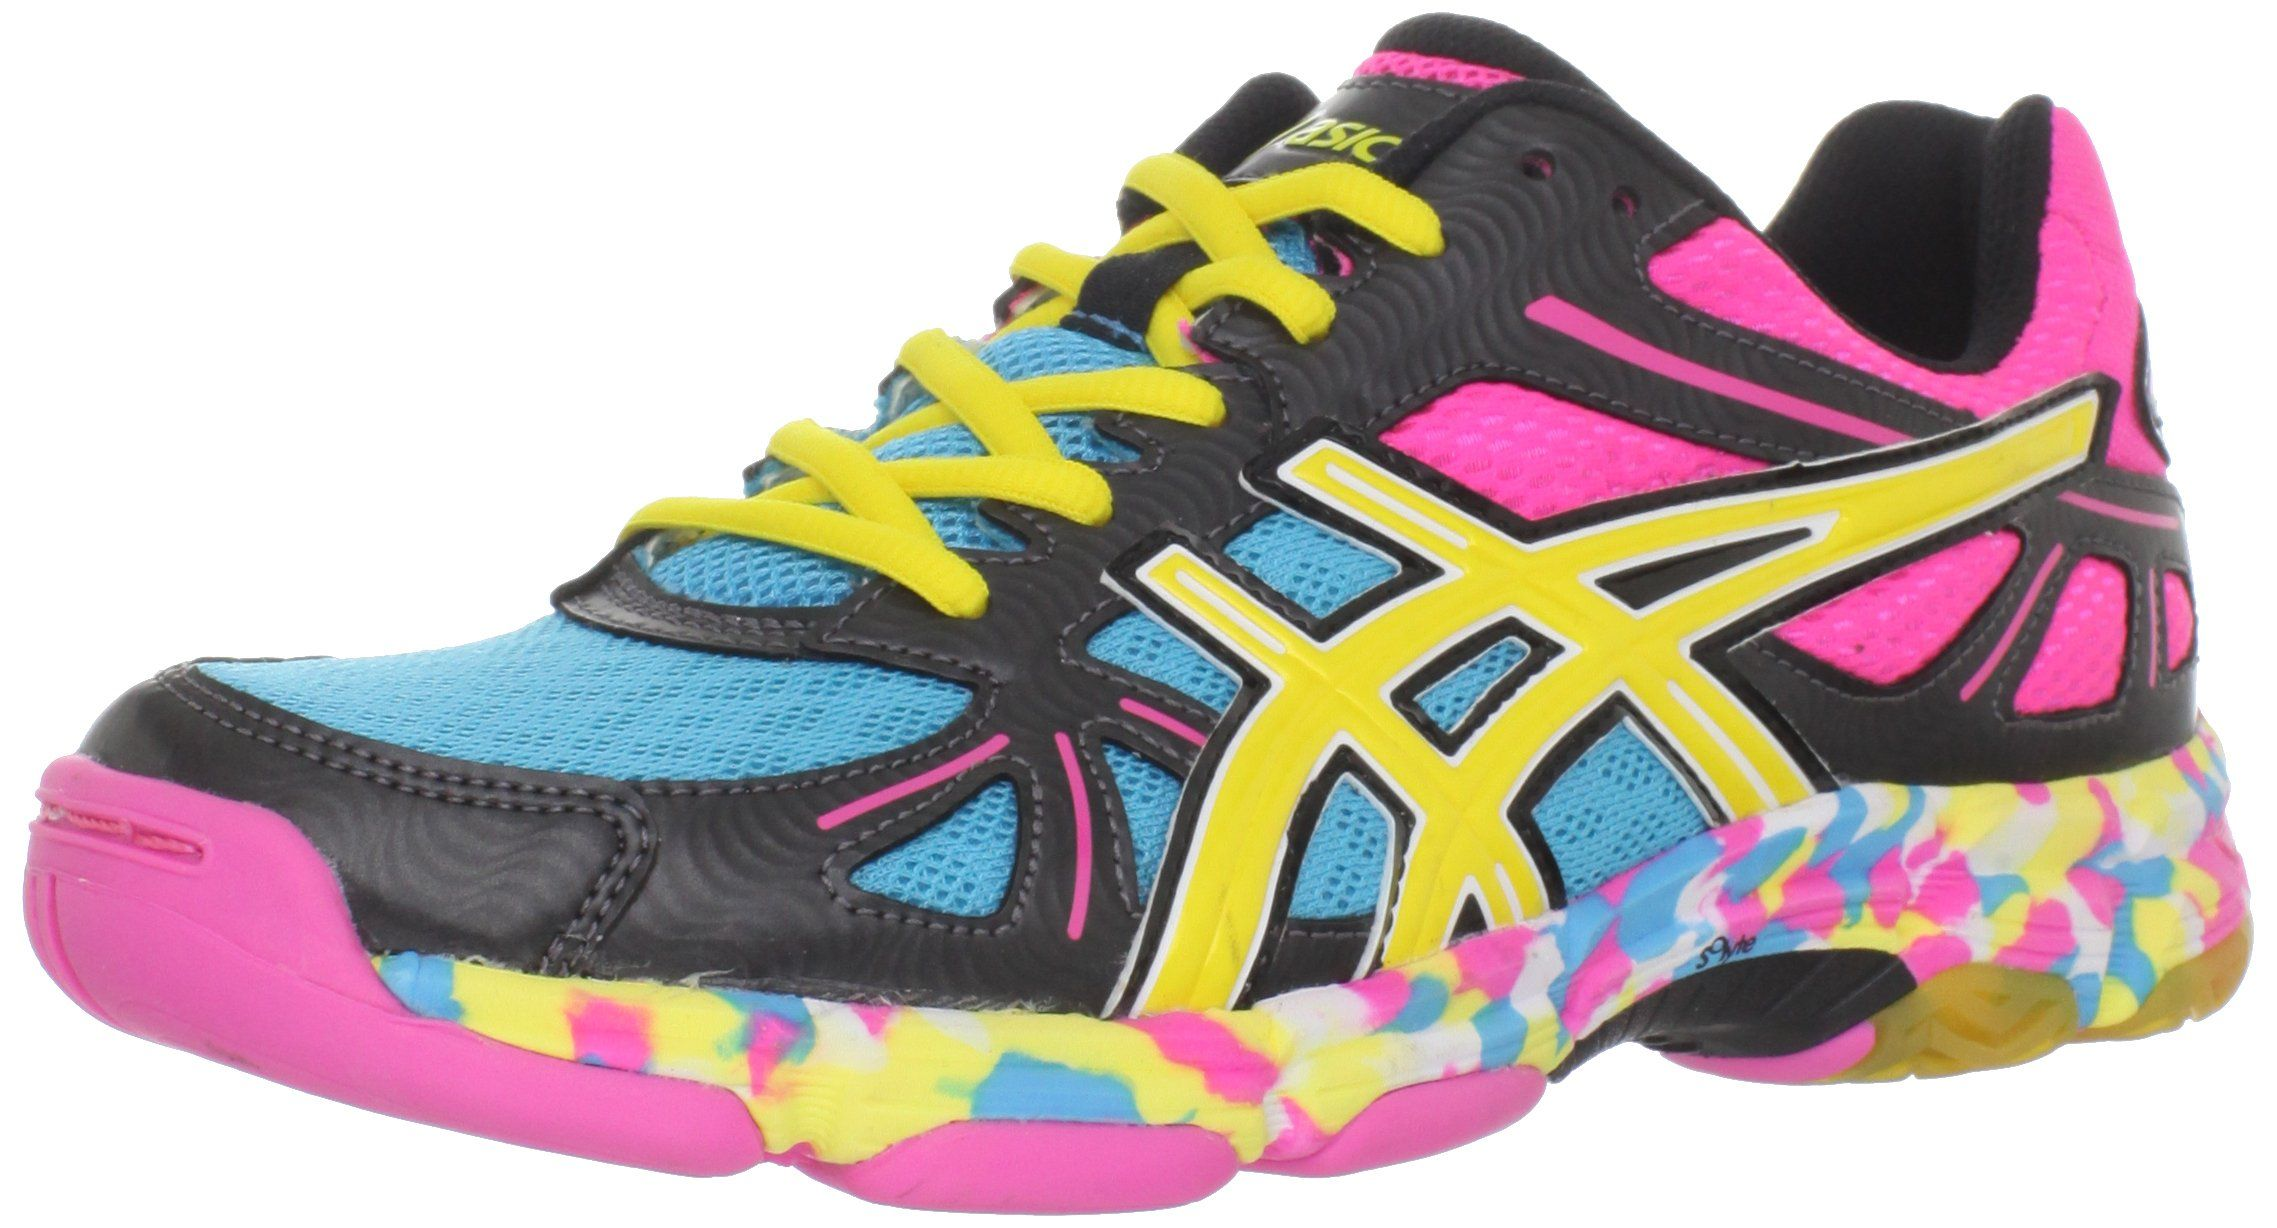 Amazon.com: ASICS Women's GEL-Flashpoint Volleyball Shoe: Clothing